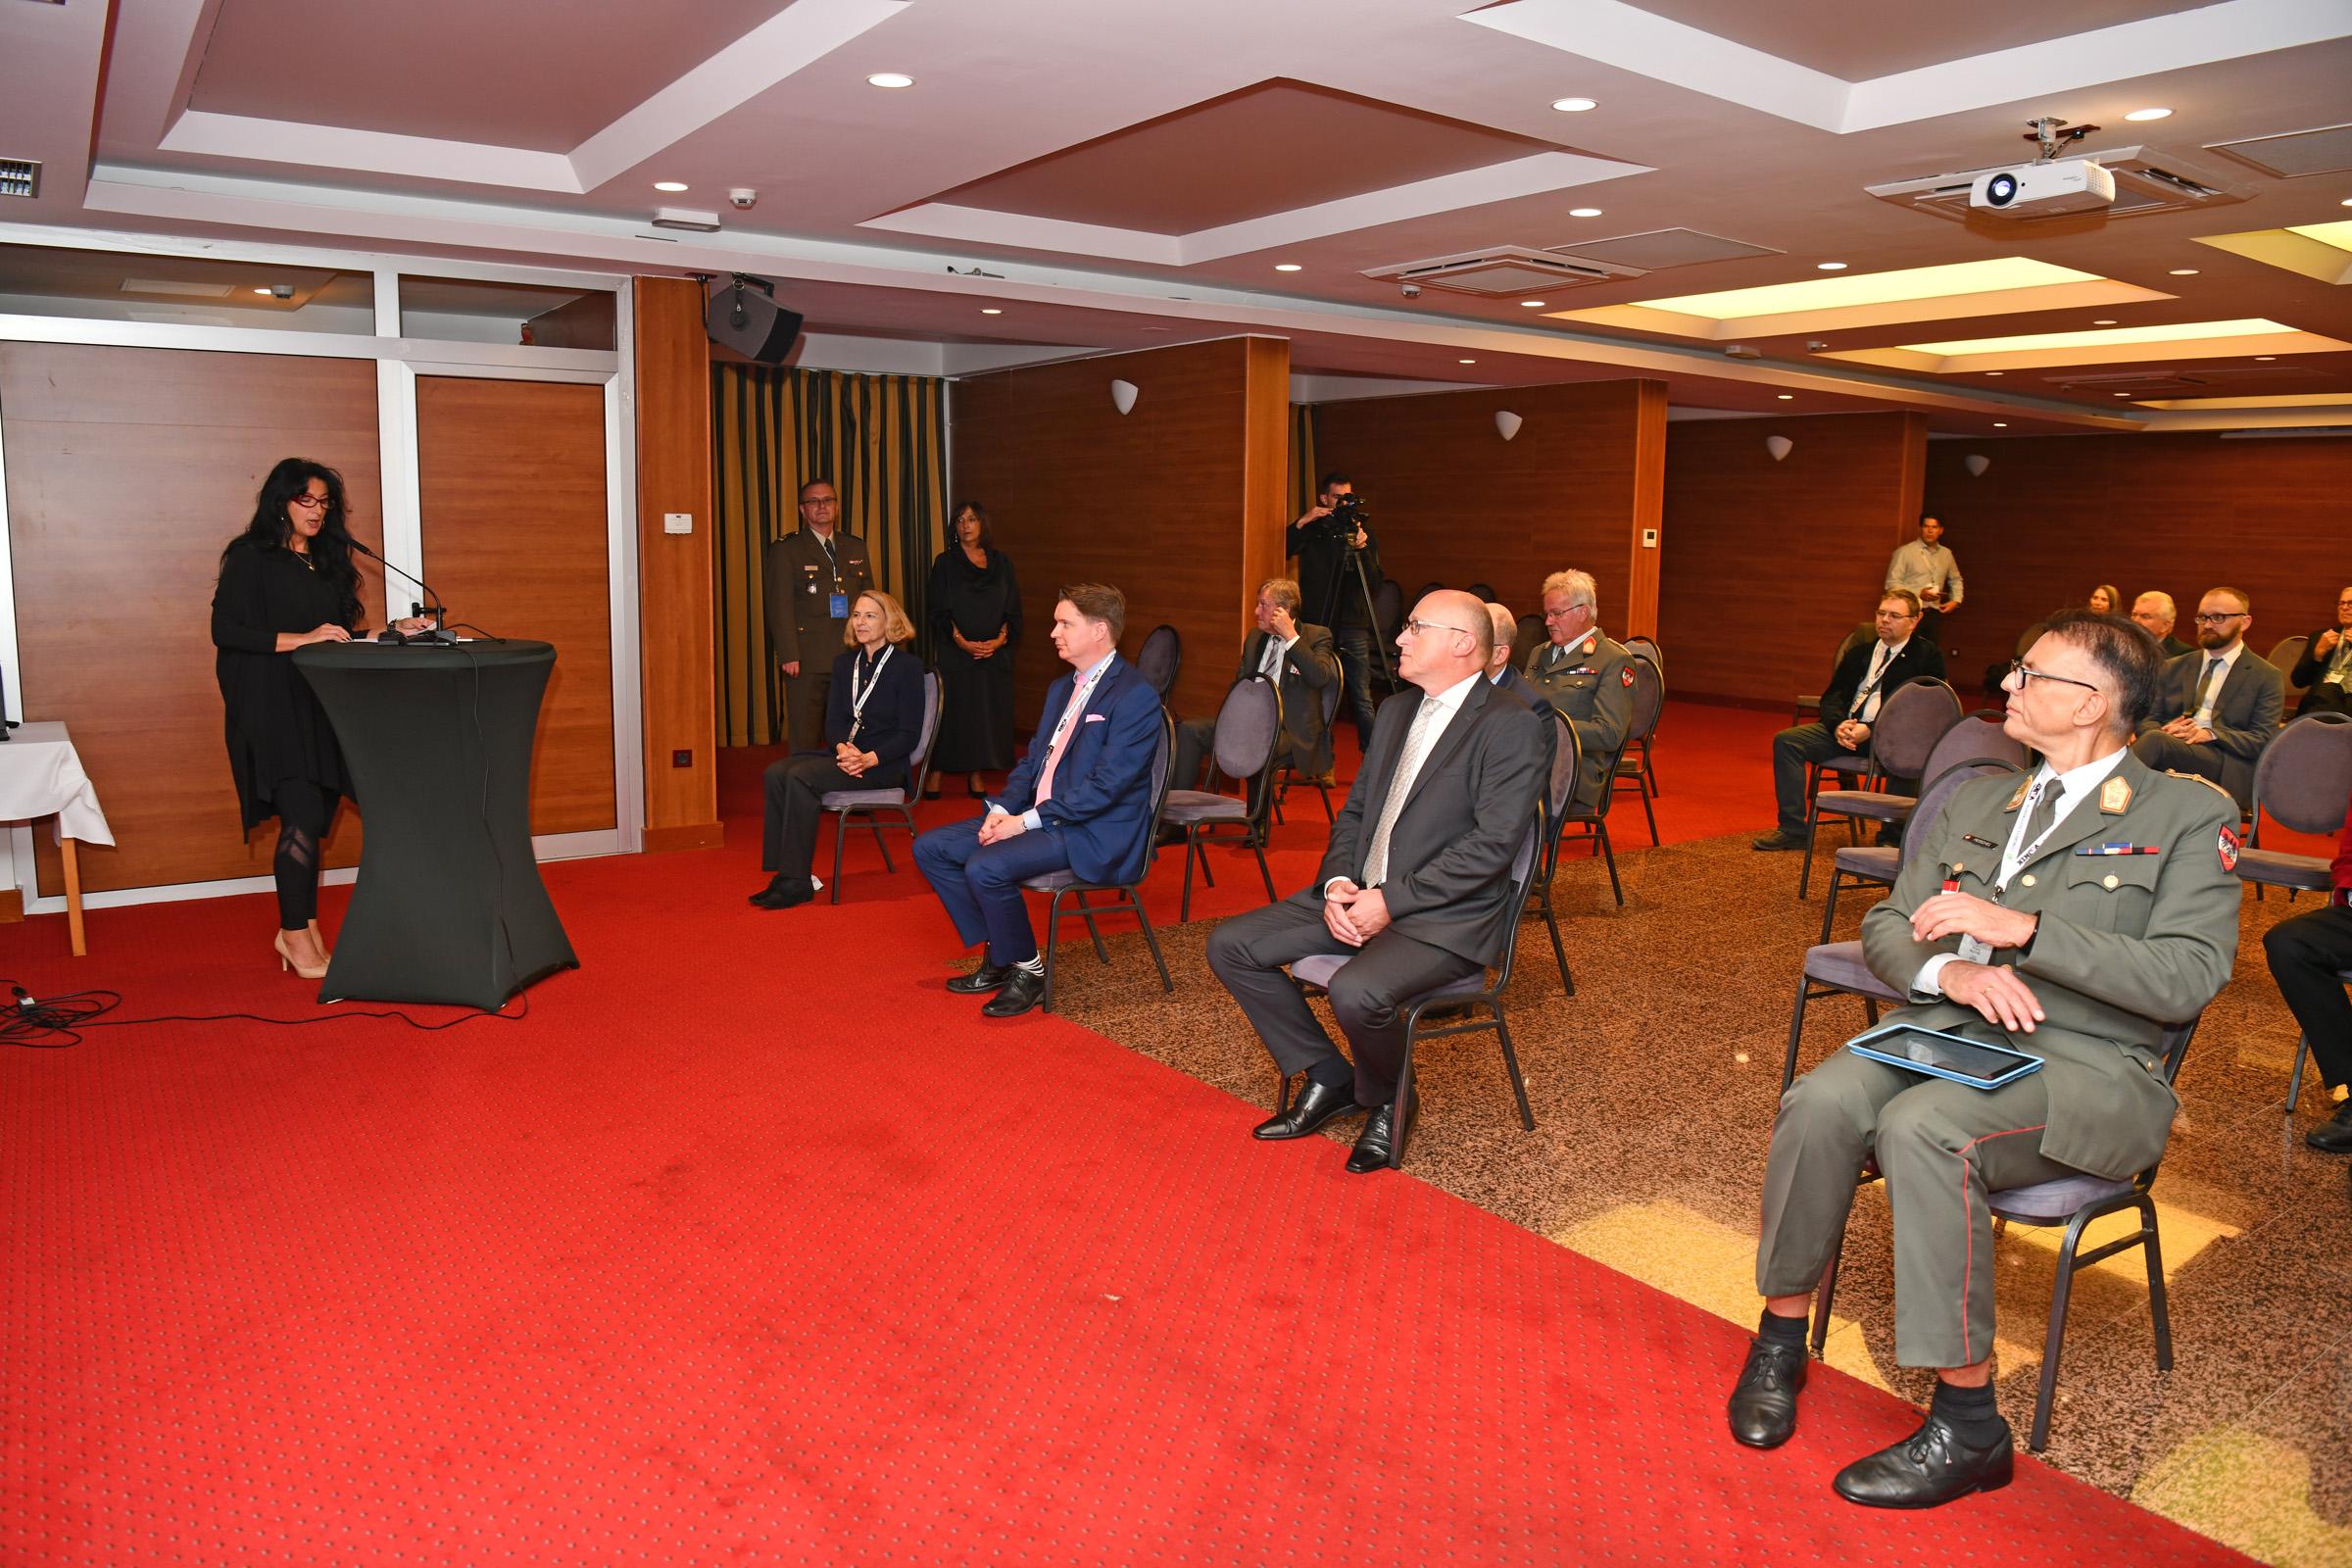 U Zadru otvoren kongres Europskog udruženja vojnih novinara